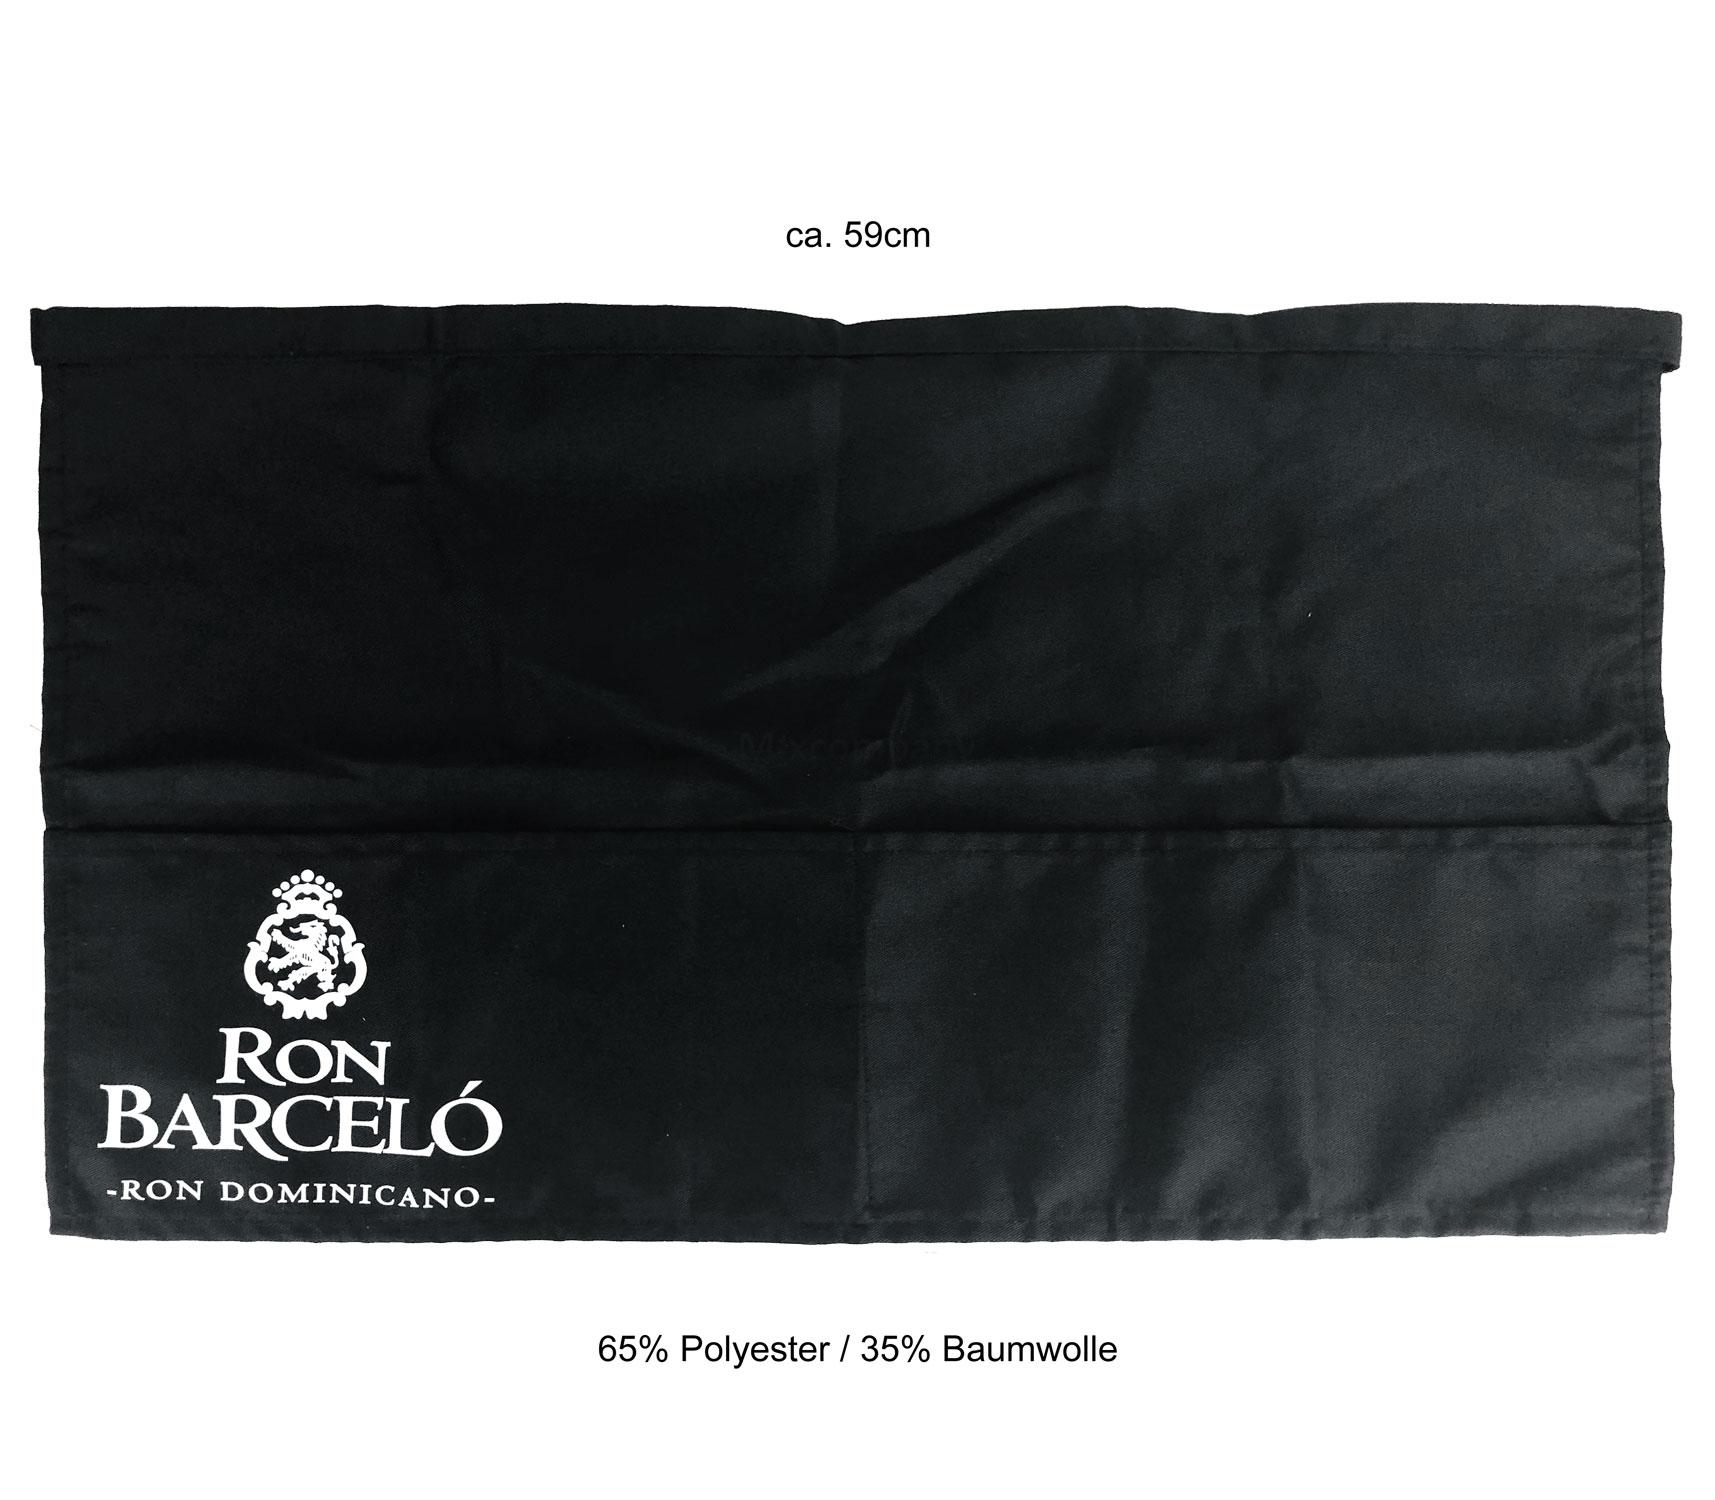 Ron Barcelo Kellner Schürze Bistroschürze Vorbinder Küchenschürze Kellnerschürze Bistro Gastro - ca. 59cm